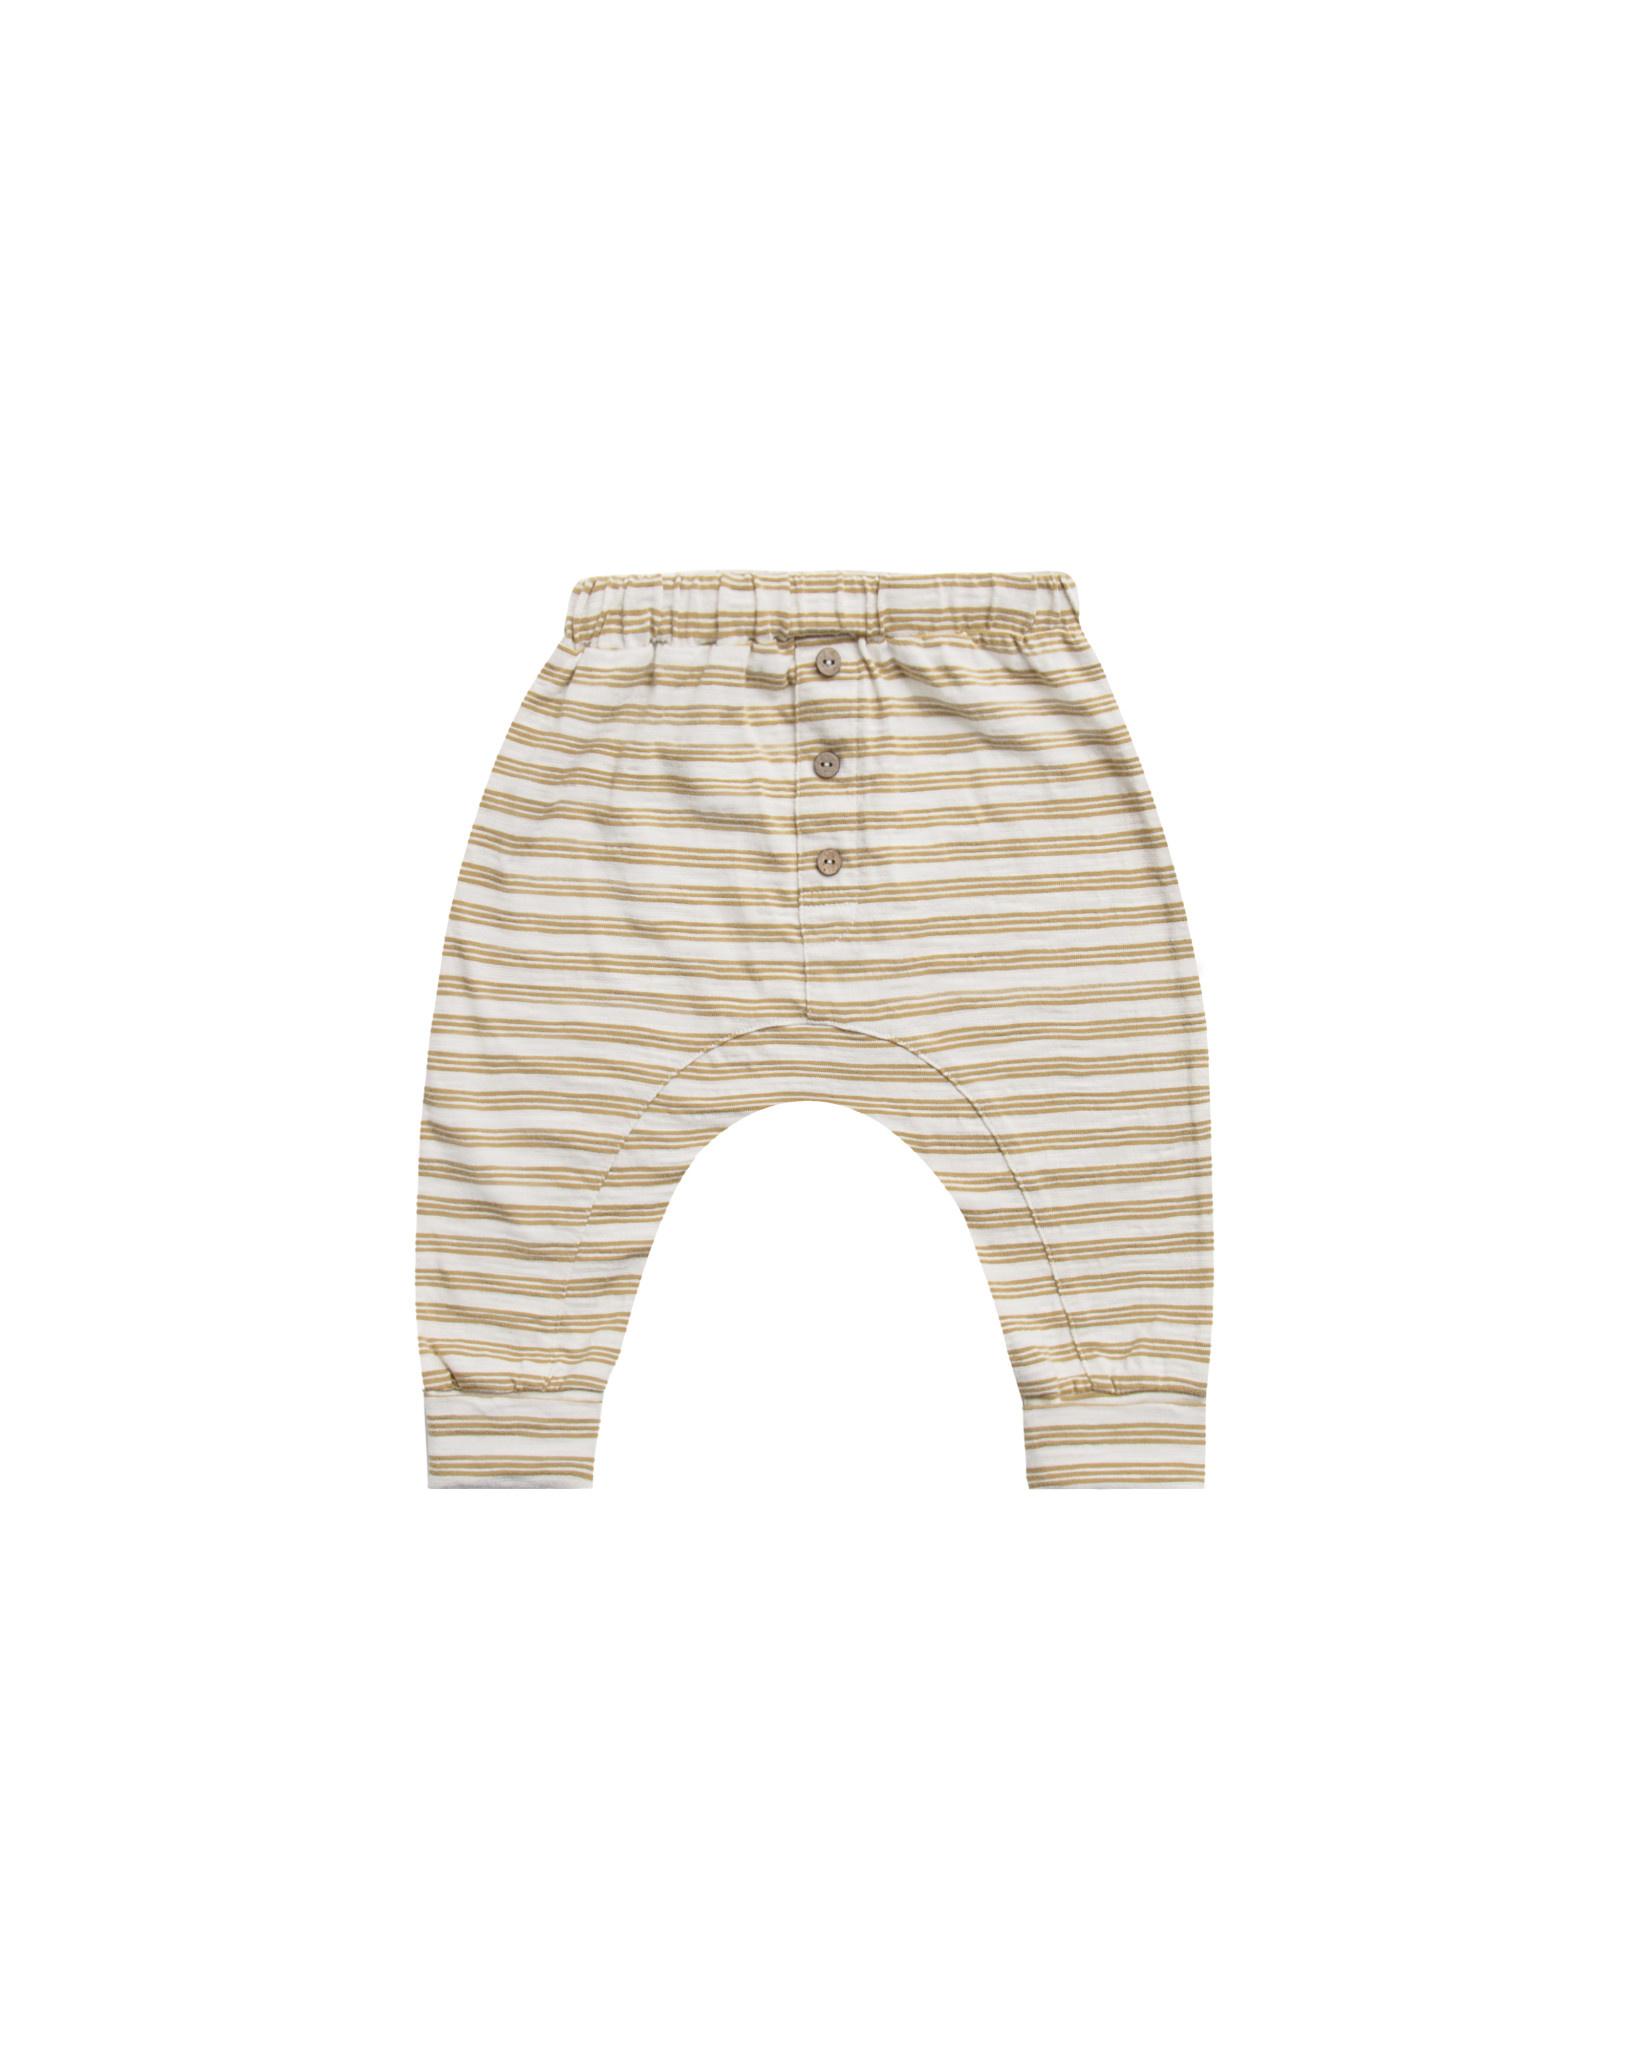 RYLEE AND CRU Gold Stripe Baby Cru Pant